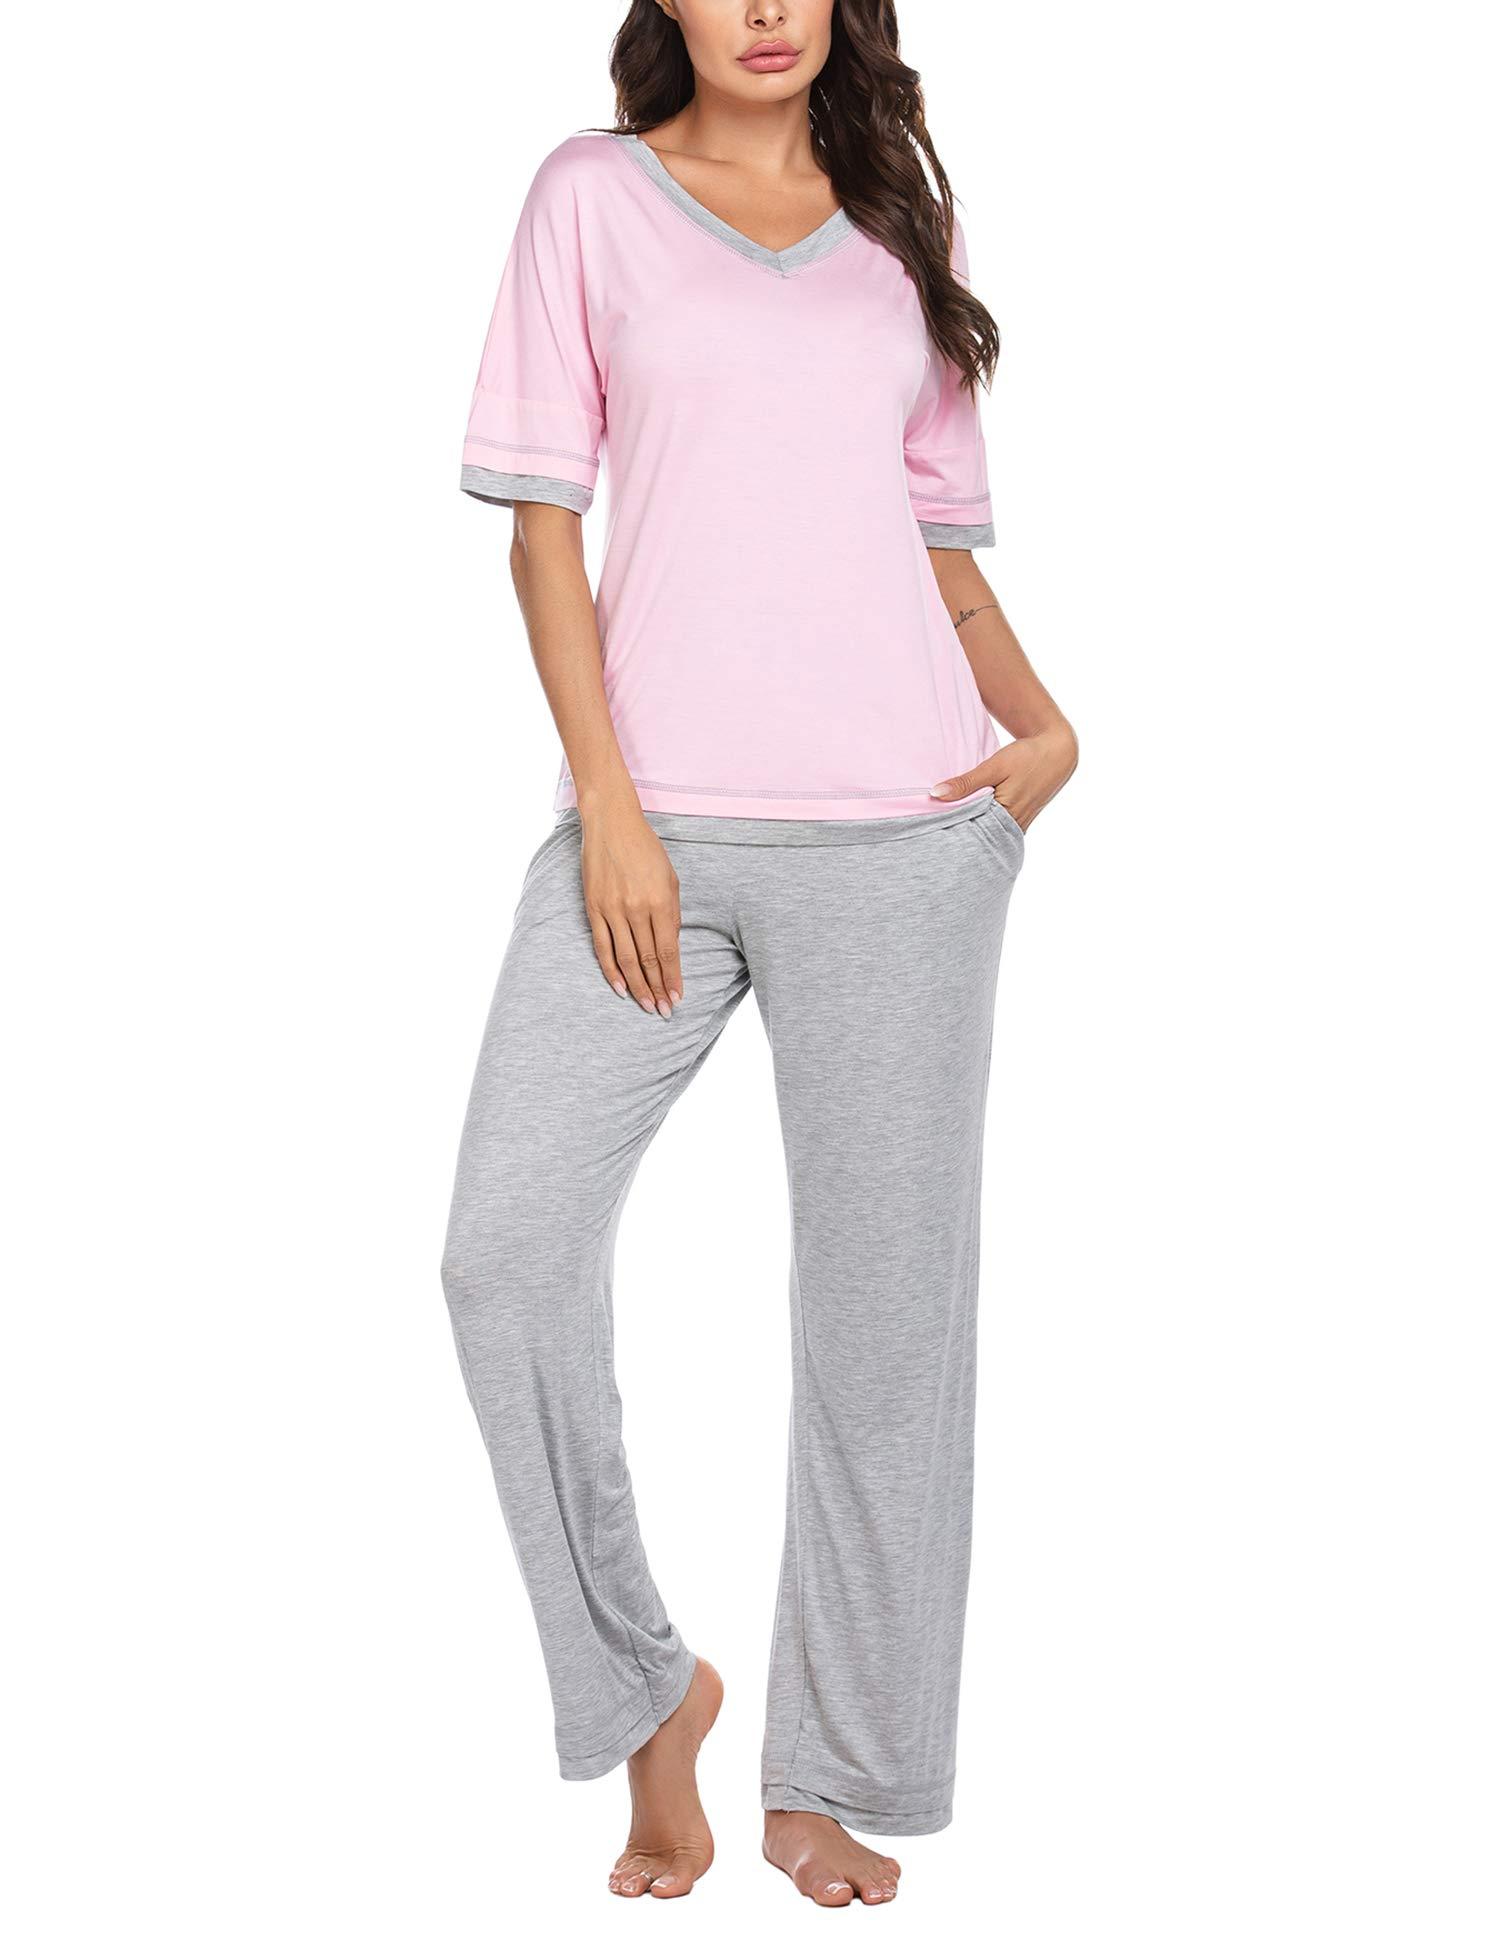 Ekouaer Pajamas Half Sleeve Pajama Set Top with Bottom Pjs V-Neck Sleepwear Soft Loungewear Set S-XXL